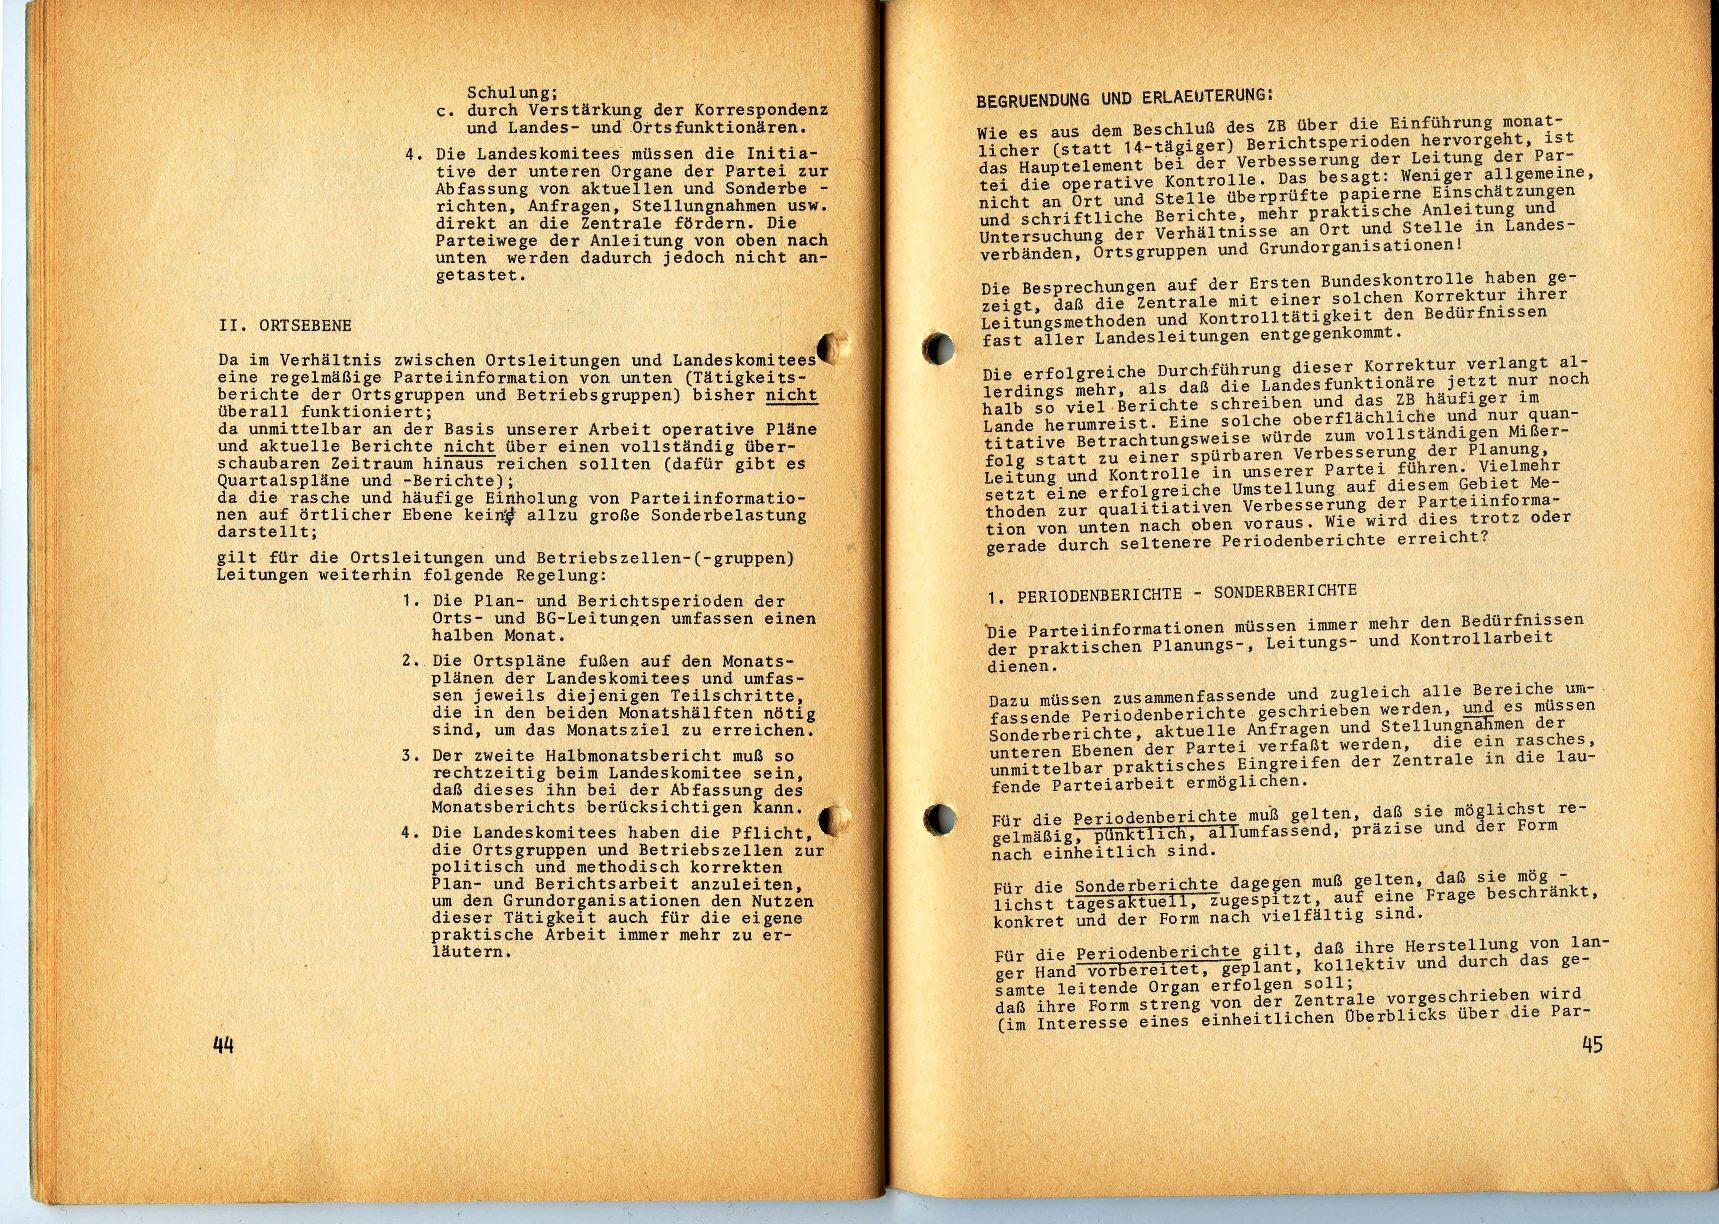 ZB_Parteiarbeiter_1971_04_23